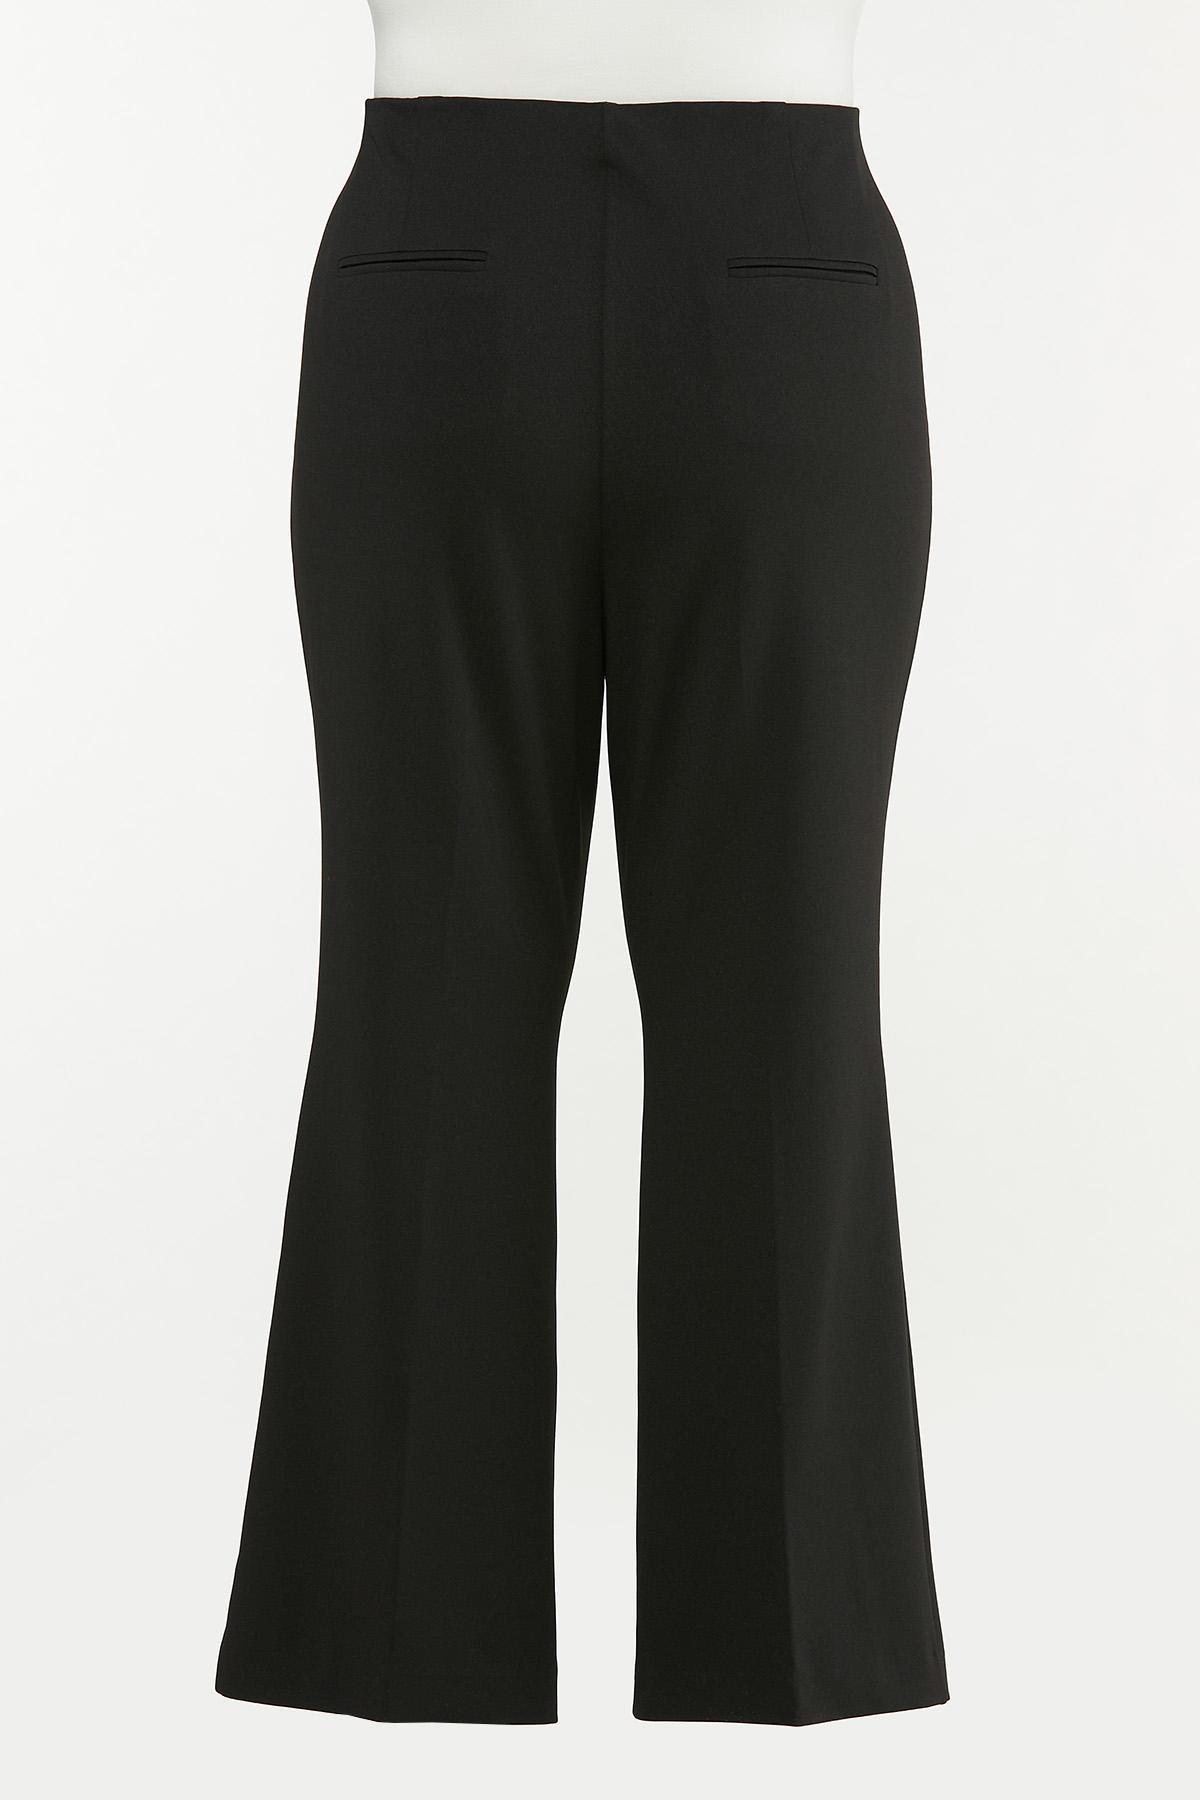 Plus Petite Sailor Button Pull-On Pants (Item #44651701)